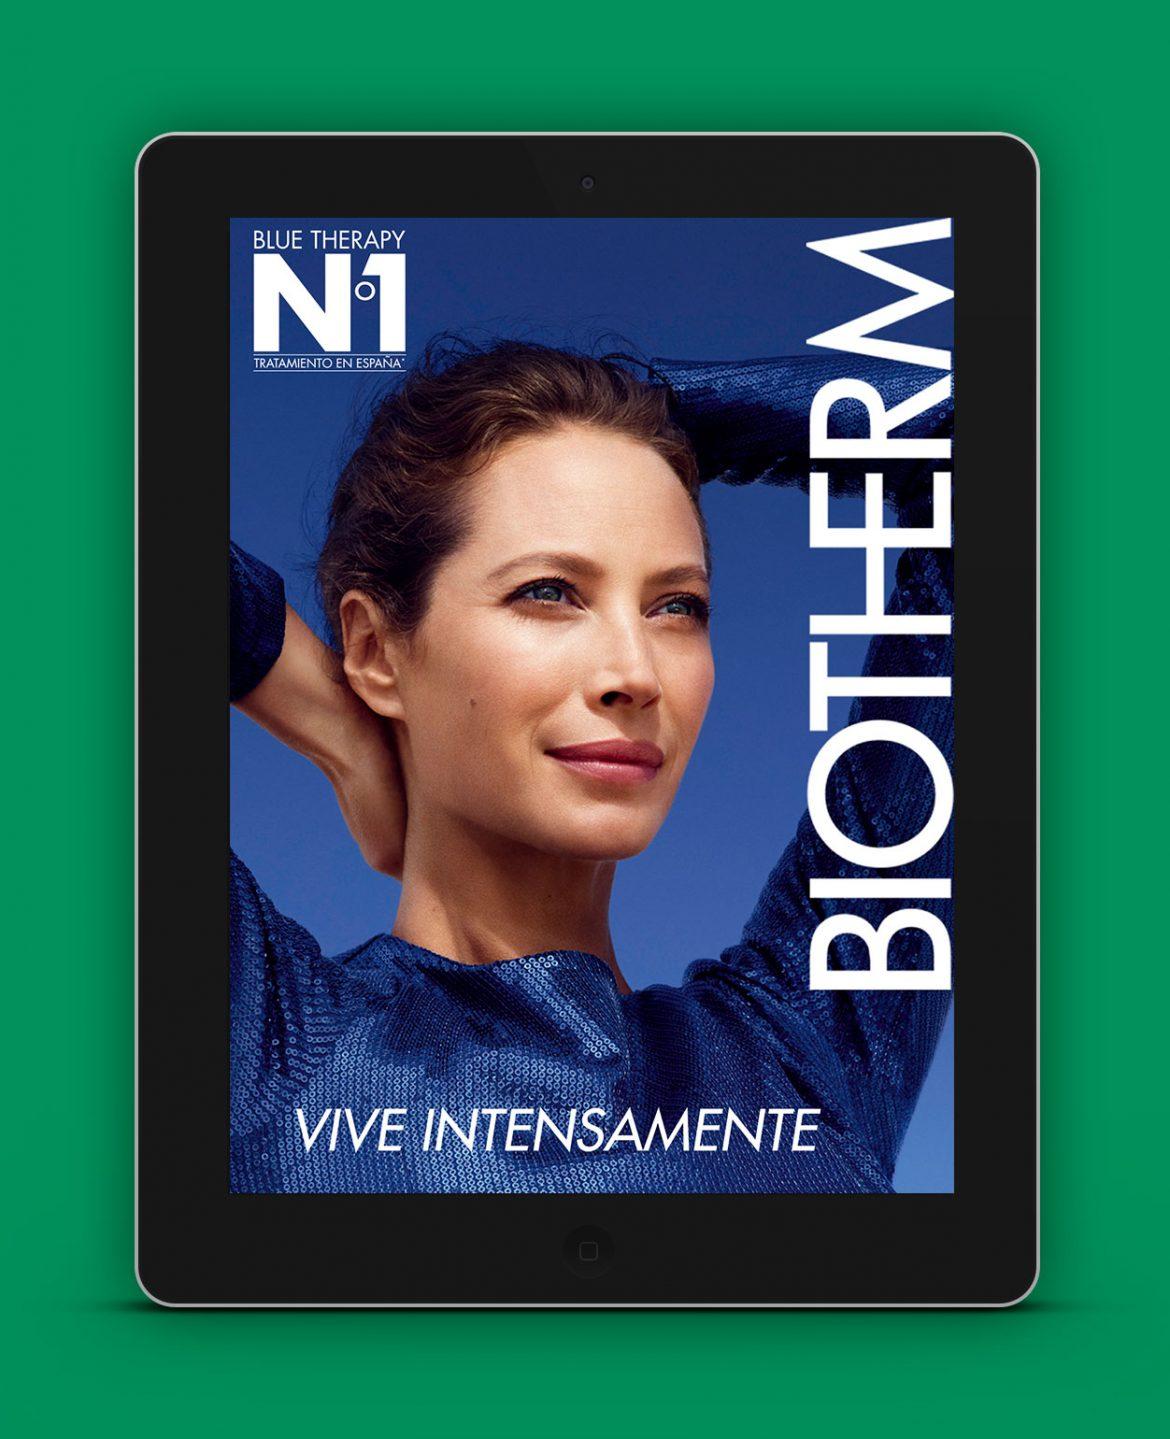 Loreal / Biotherm